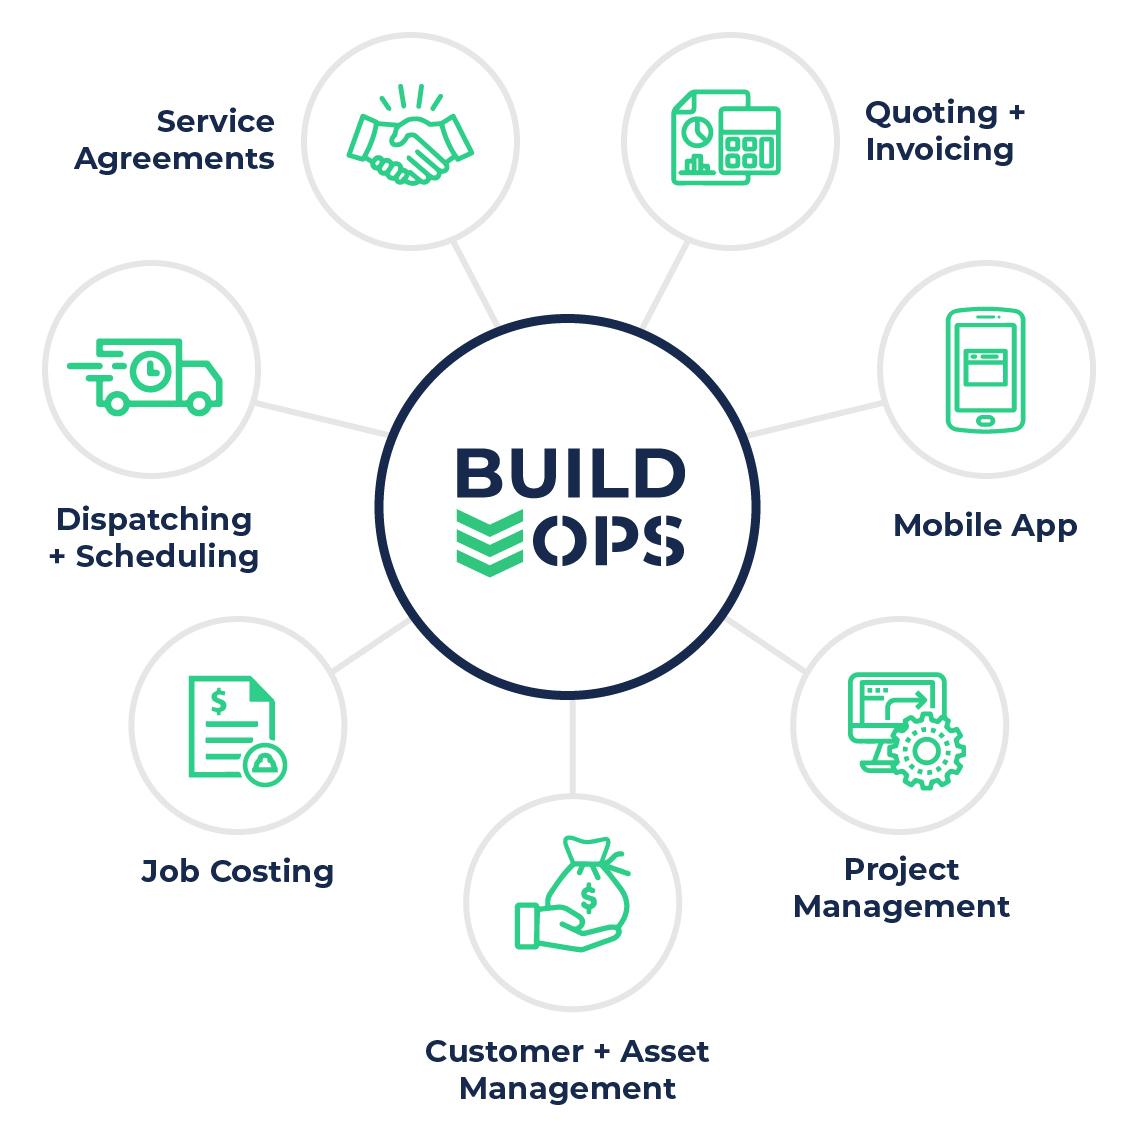 Features of build ops platform